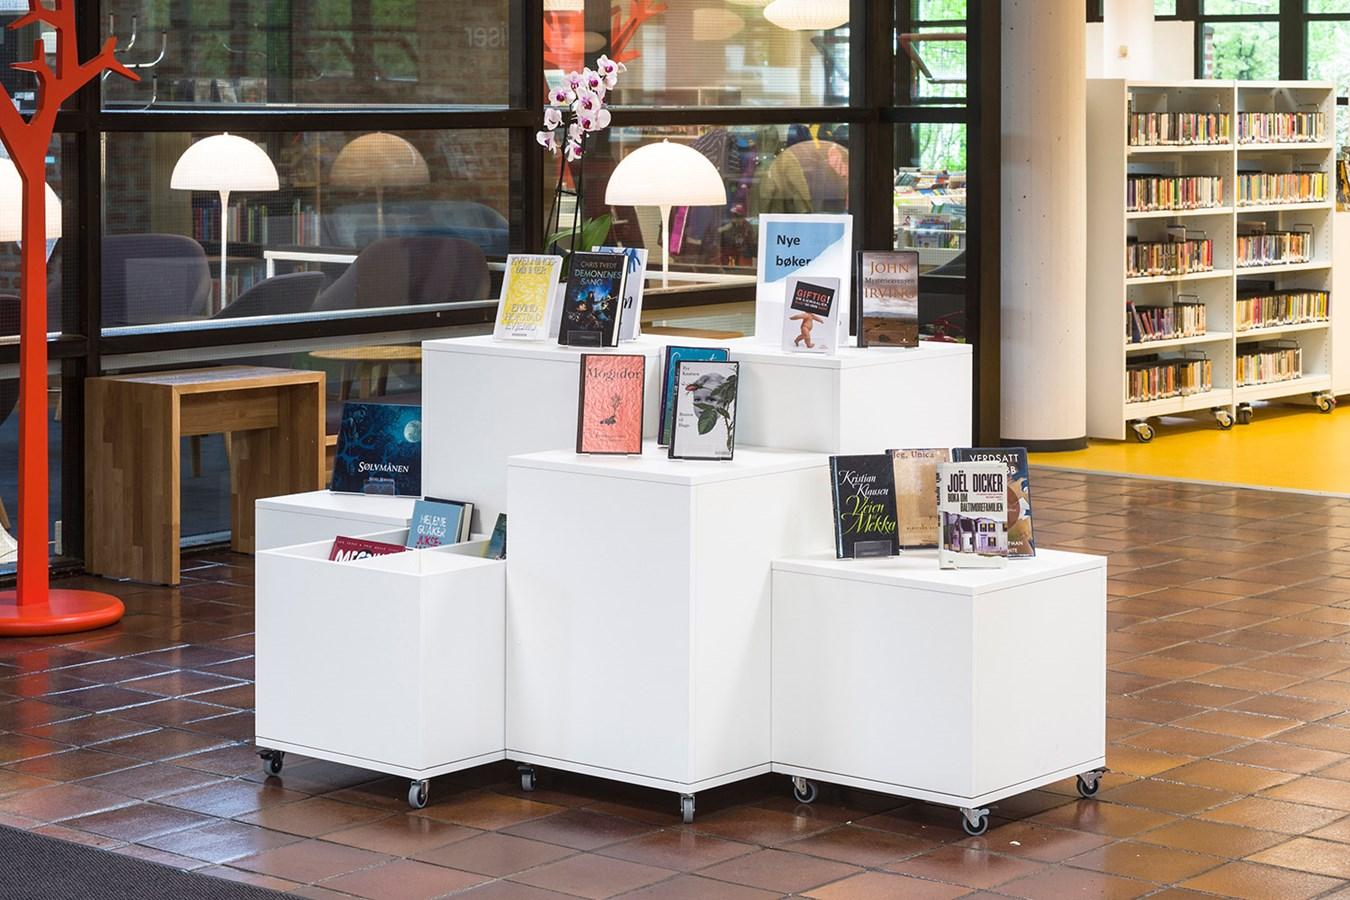 Bærum Bibliotek. Bekkestua